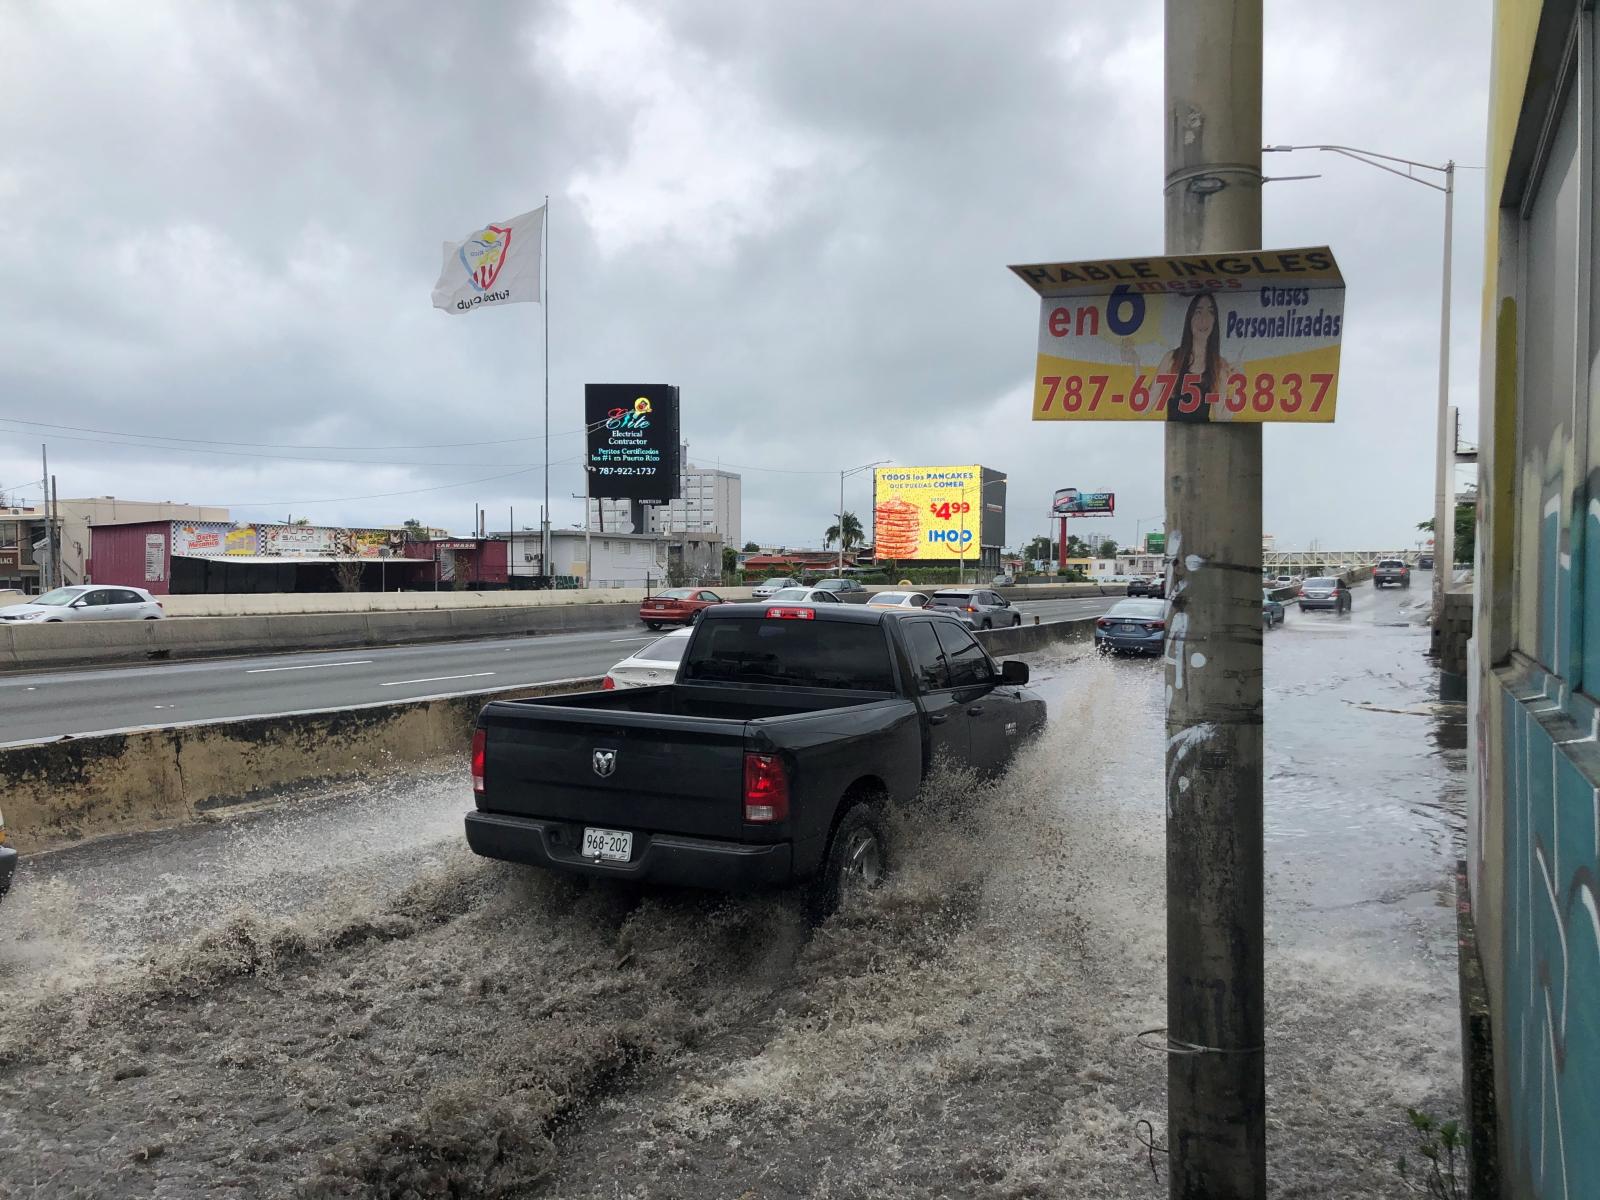 Rekordowa powódź w lutym fot. EPA/CRISTINA OZAETA HEUSEL